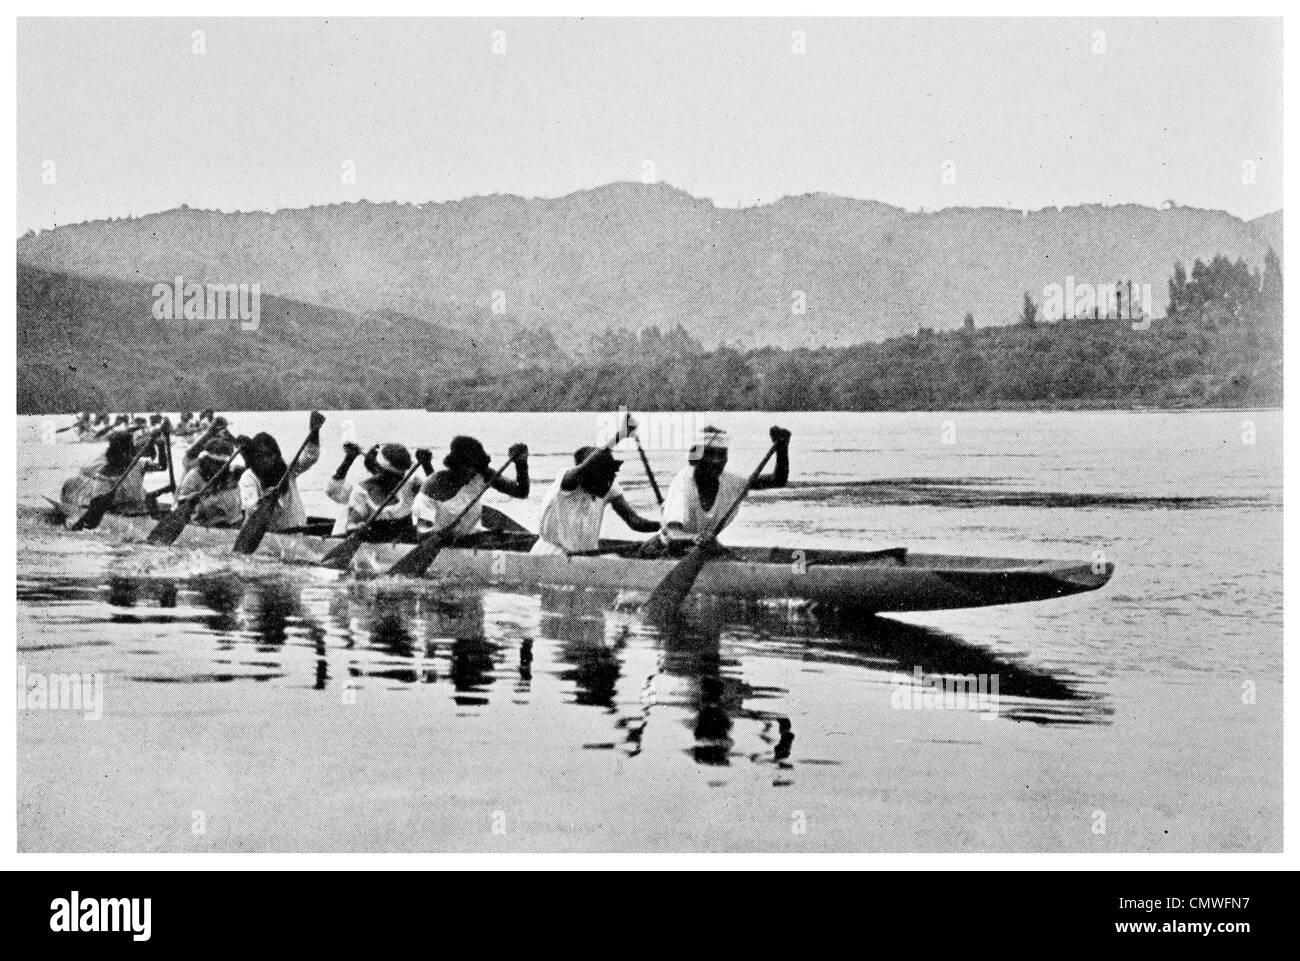 1925 Maori Women's Canoe Race Ngaruawahia Waikato region of the North Island of New Zealand - Stock Image